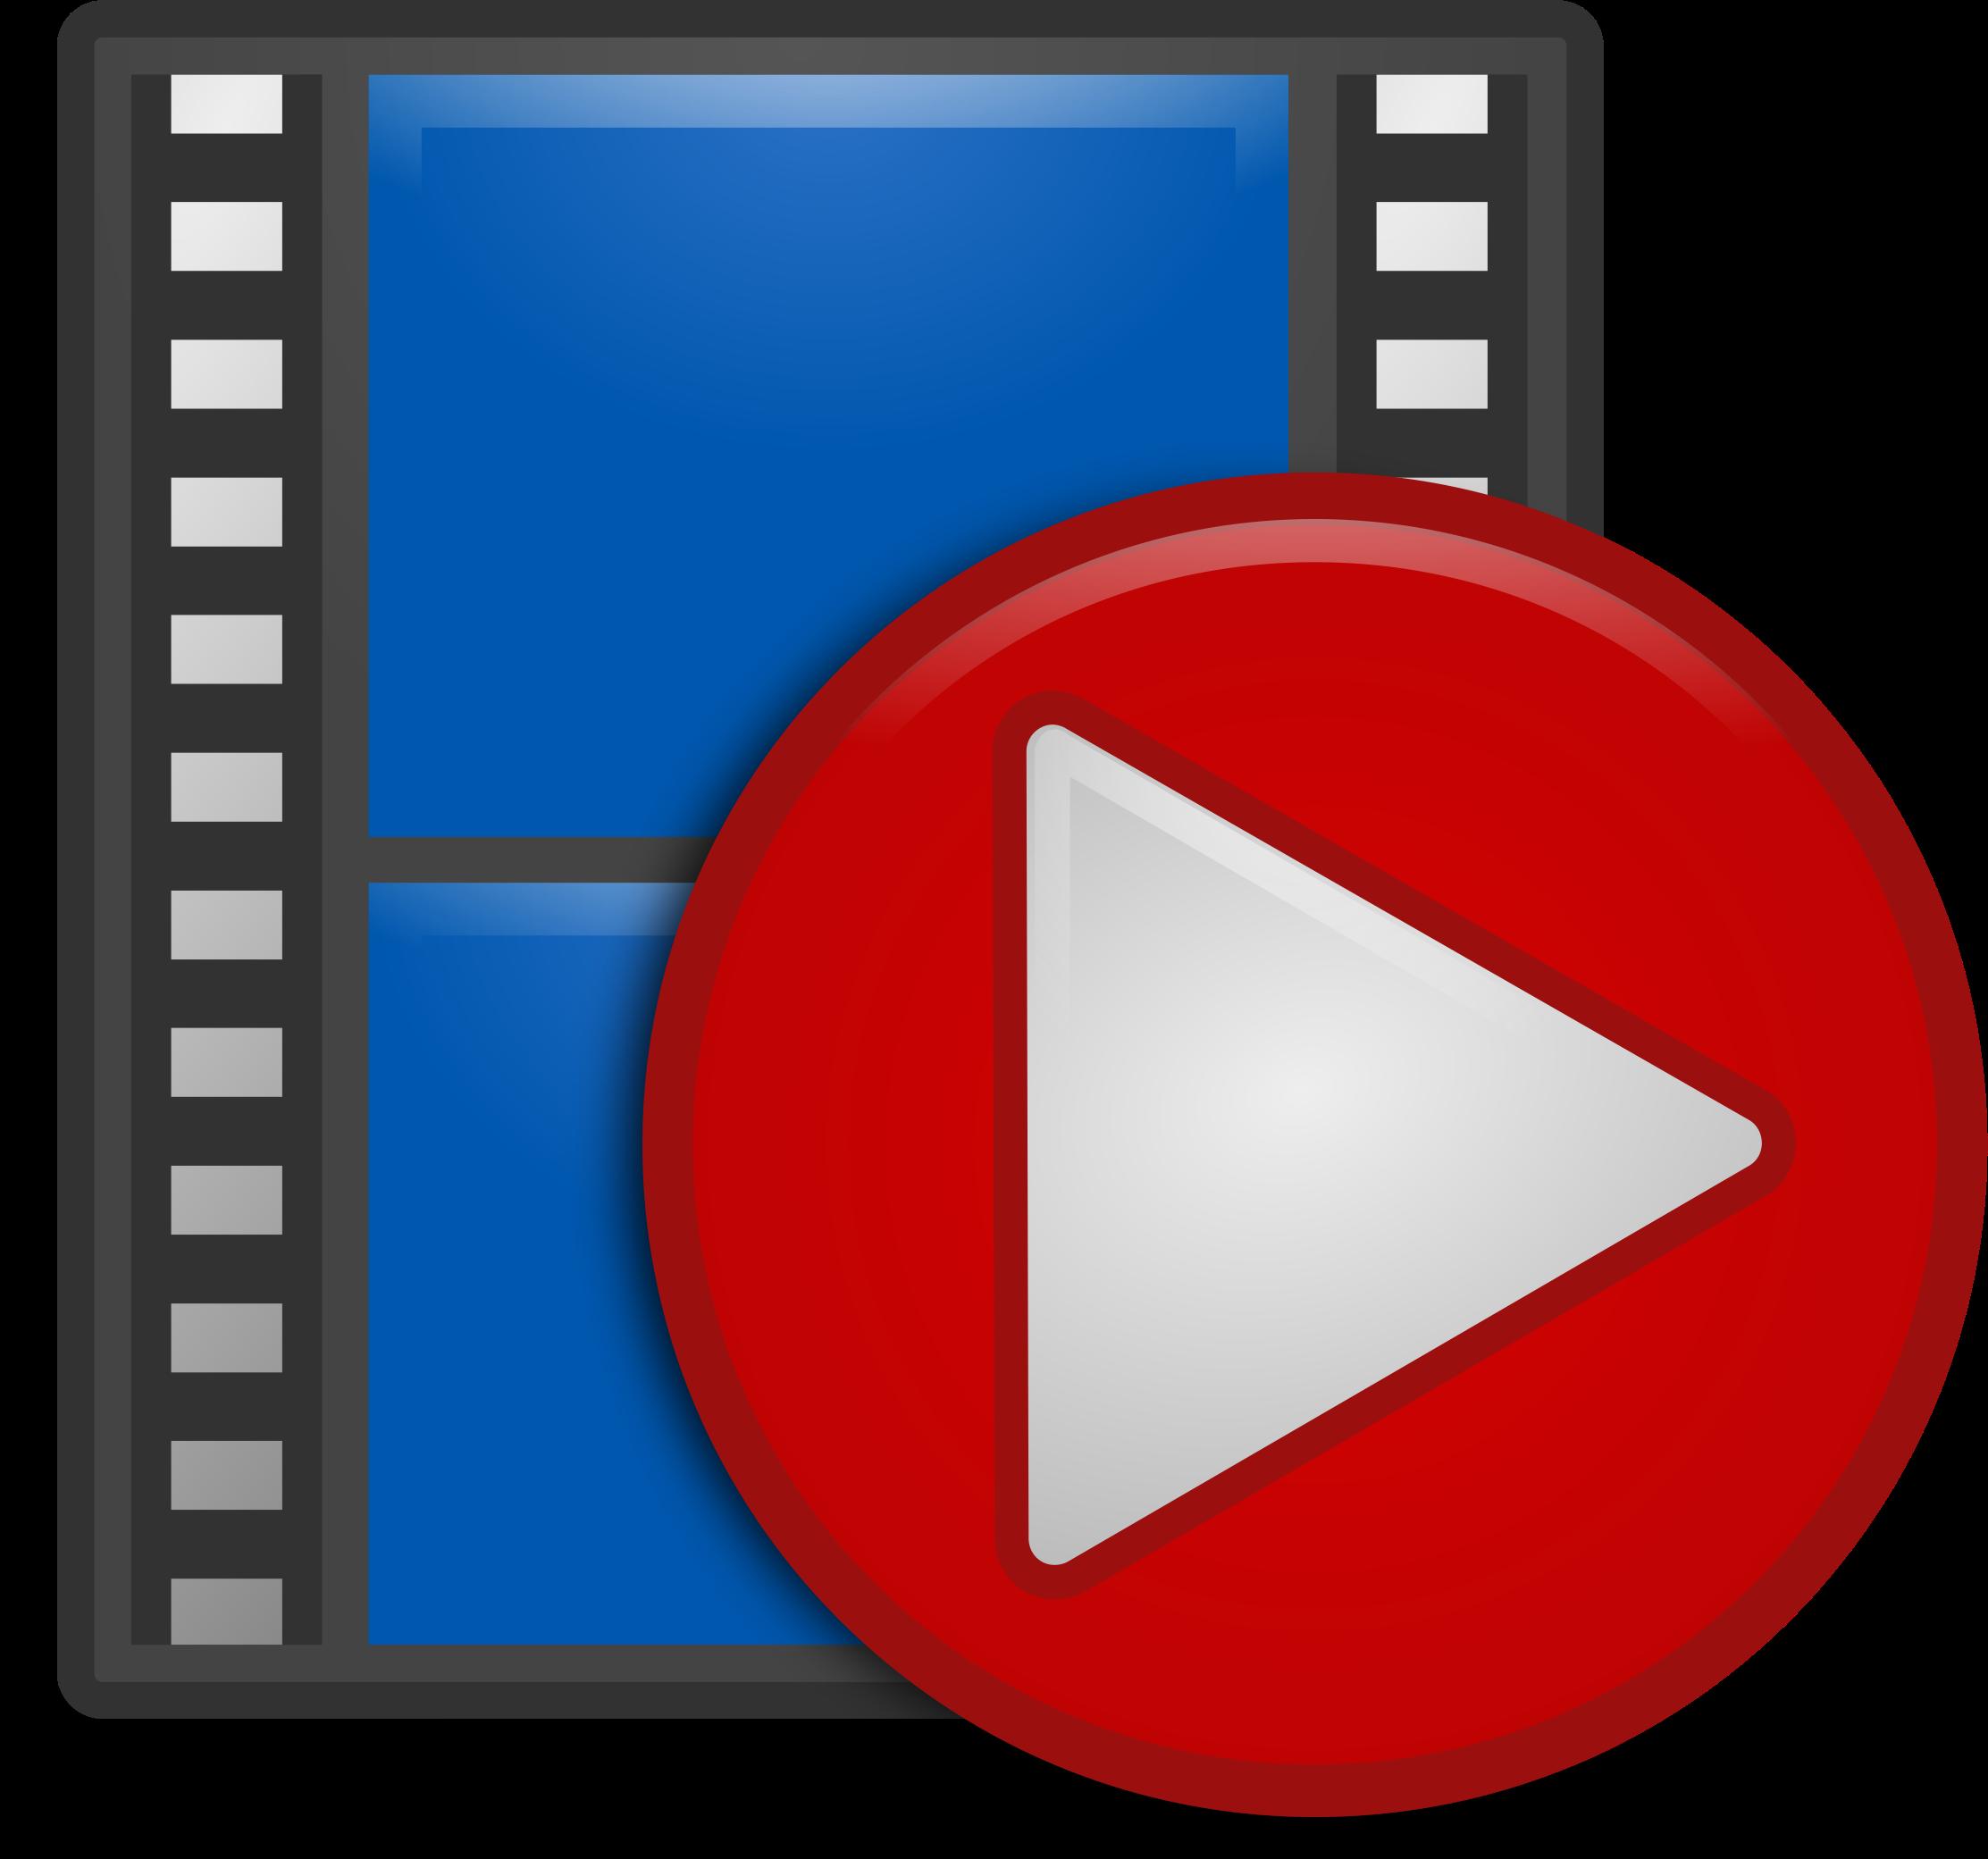 video clipart. BIG IMAGE (PNG)